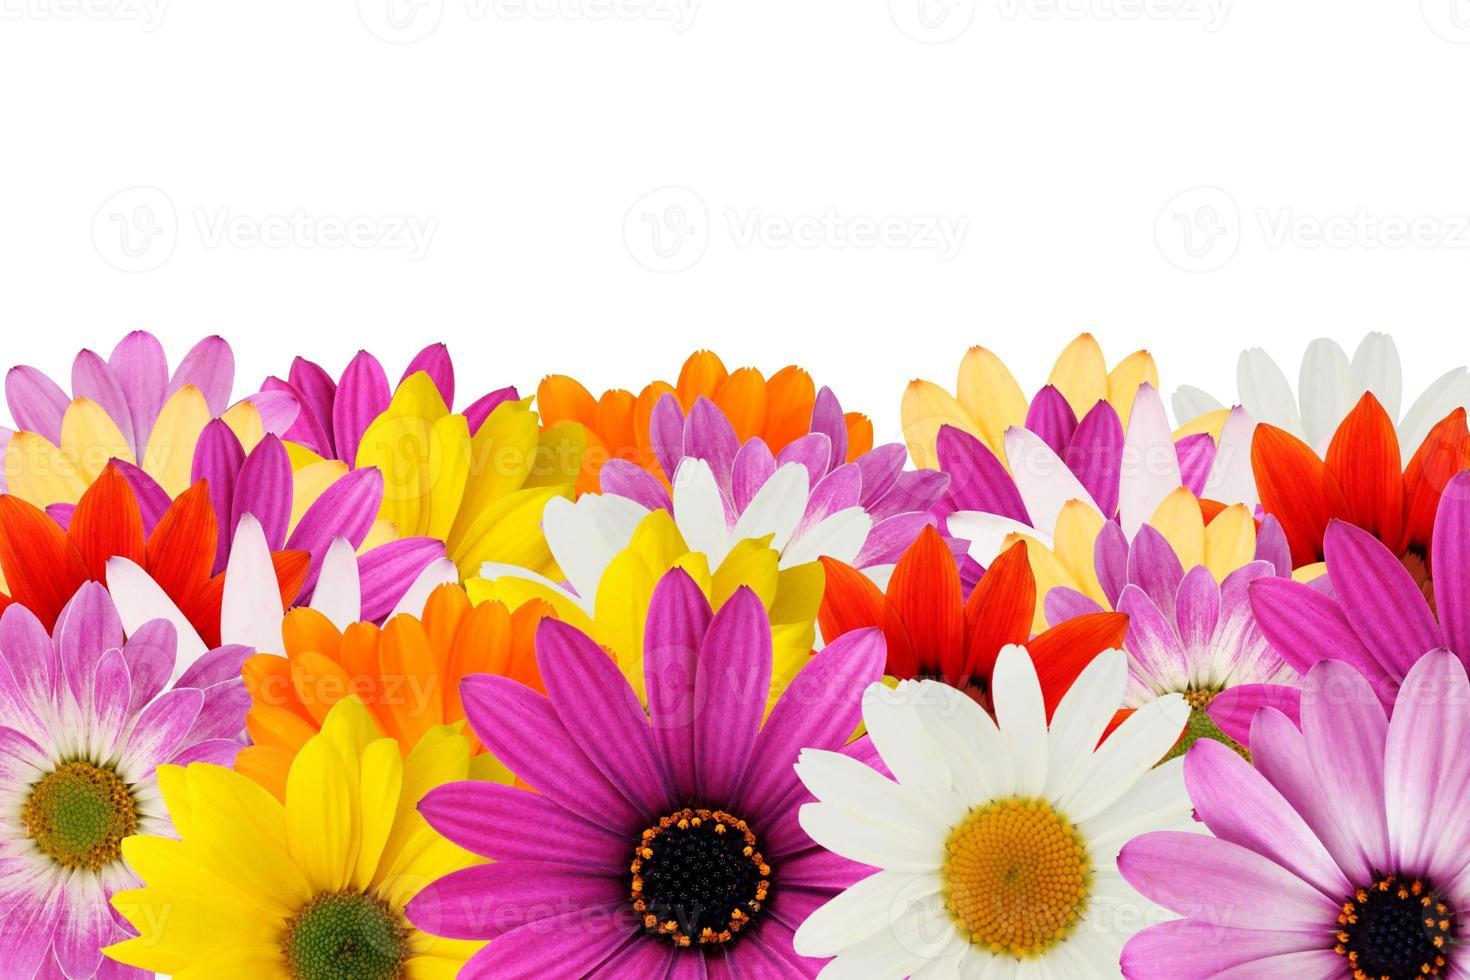 bordure de marguerite joyeuse photo